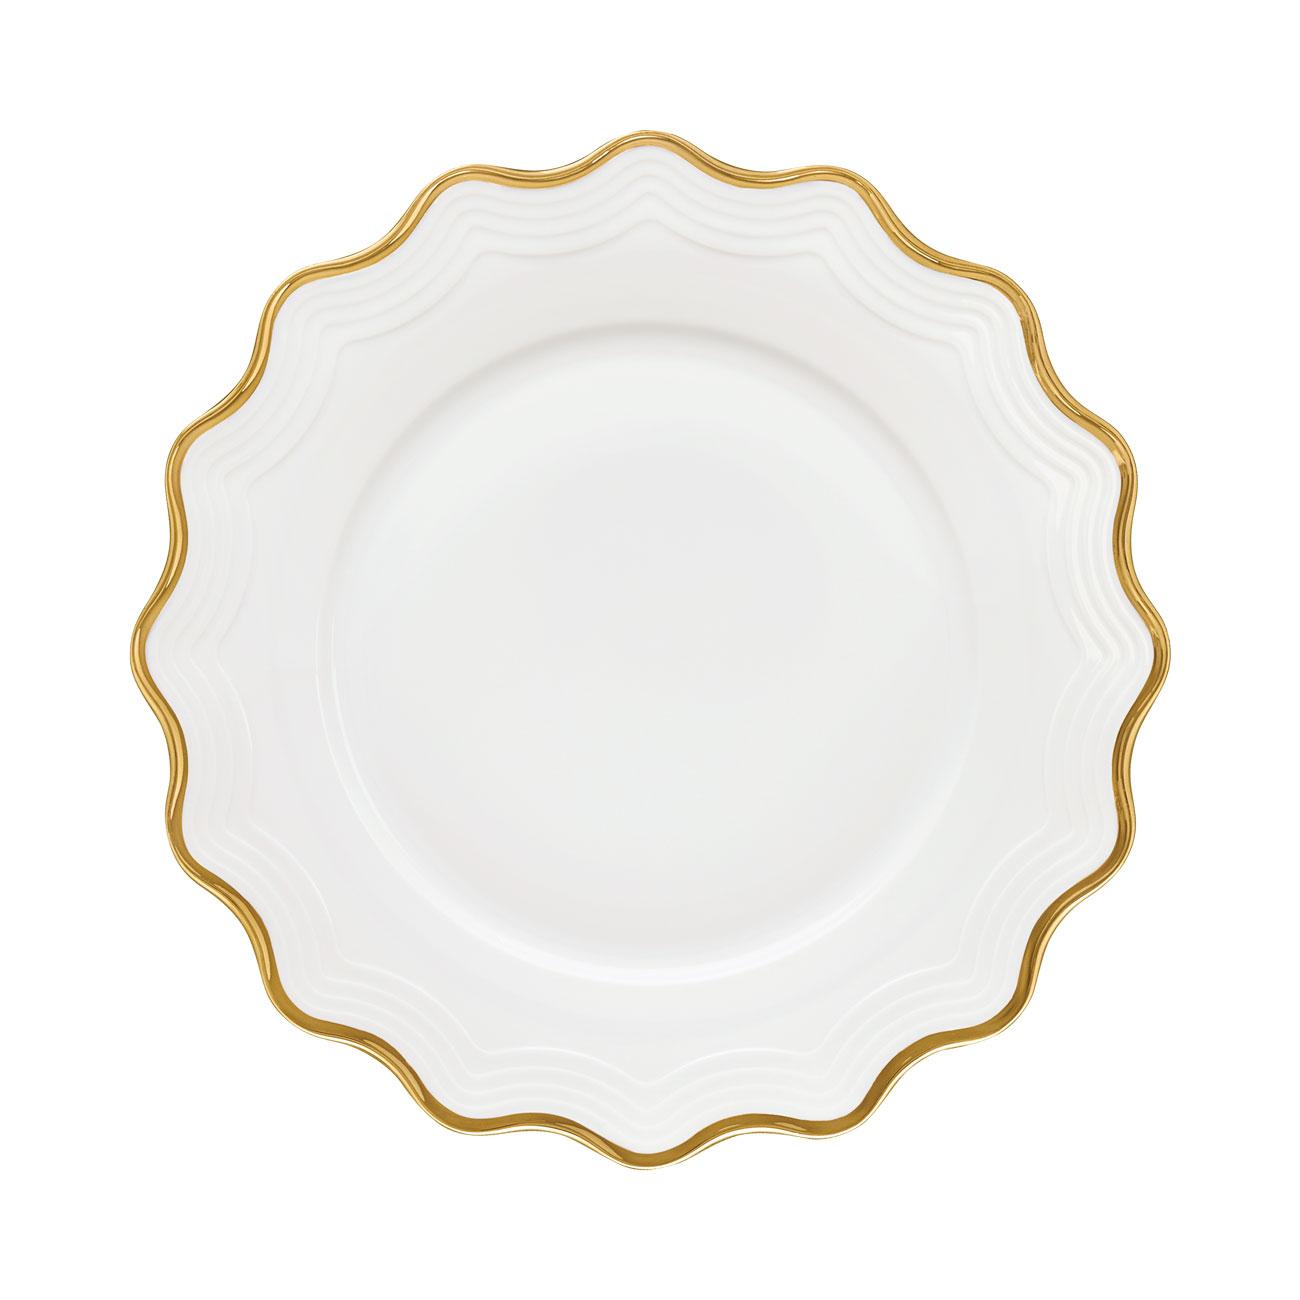 01_porcel-service-plate-maris-dor